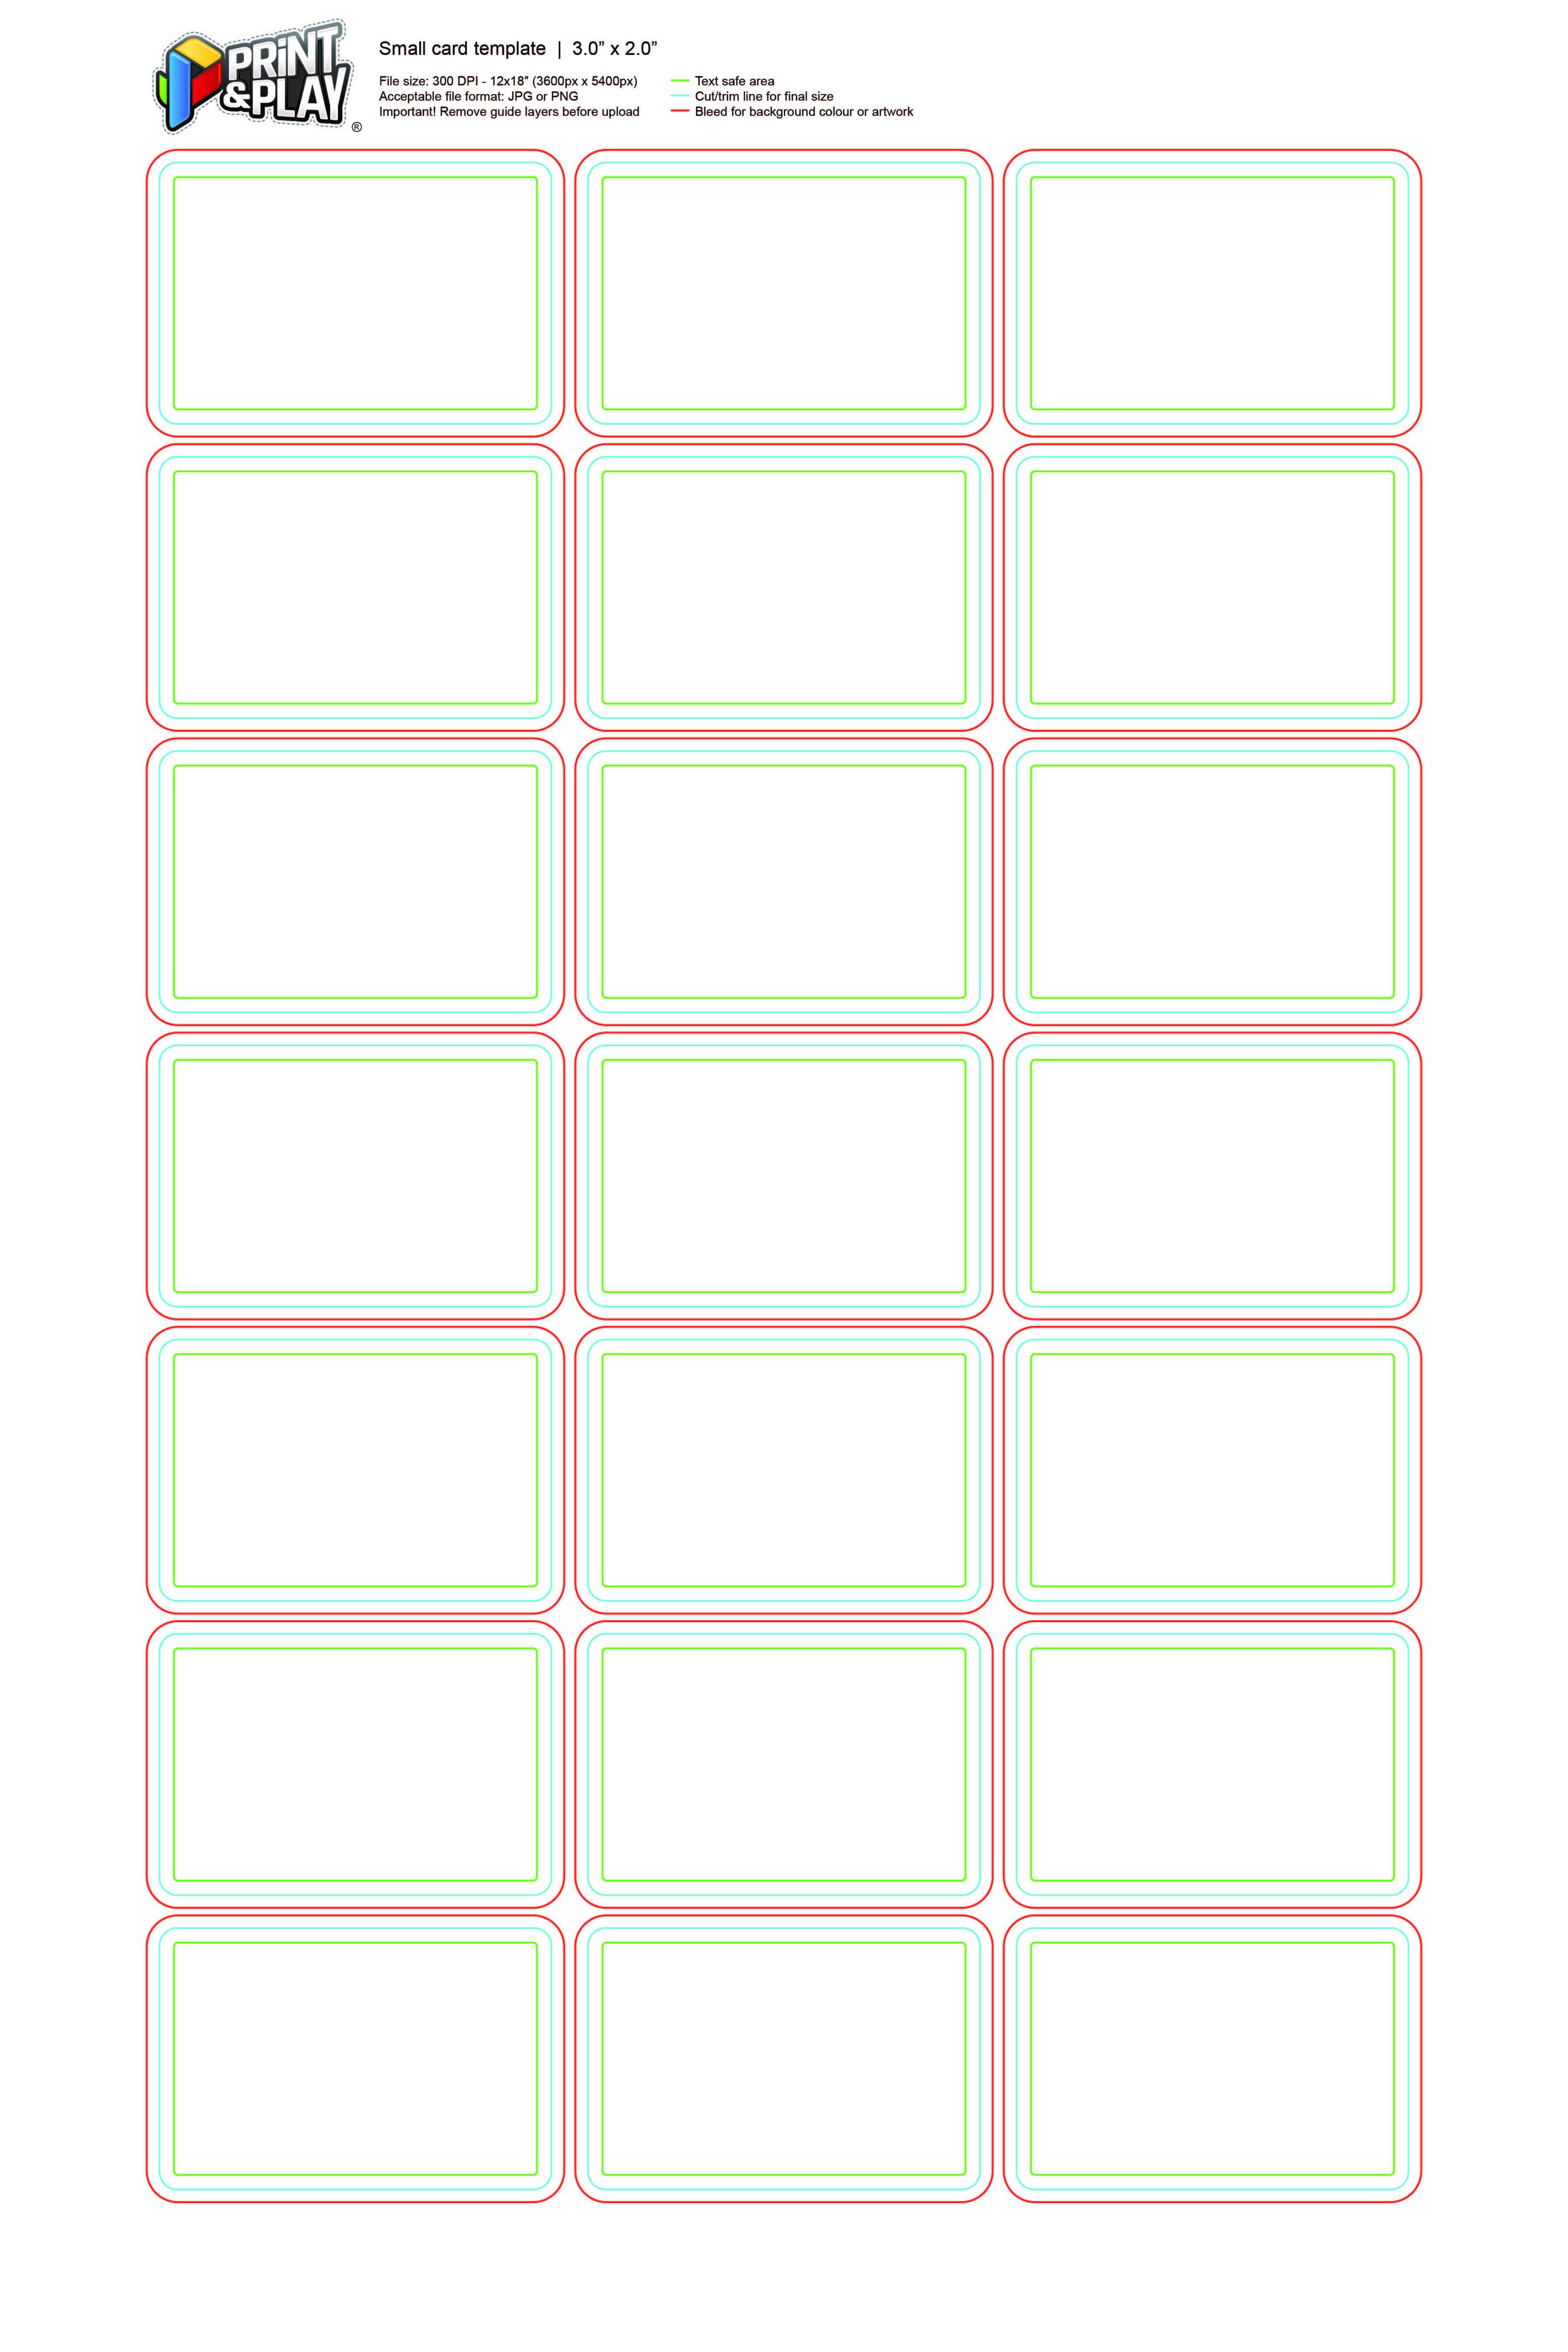 Playing Cards : Formatting & Templates – Print & Play Regarding Baseball Card Size Template